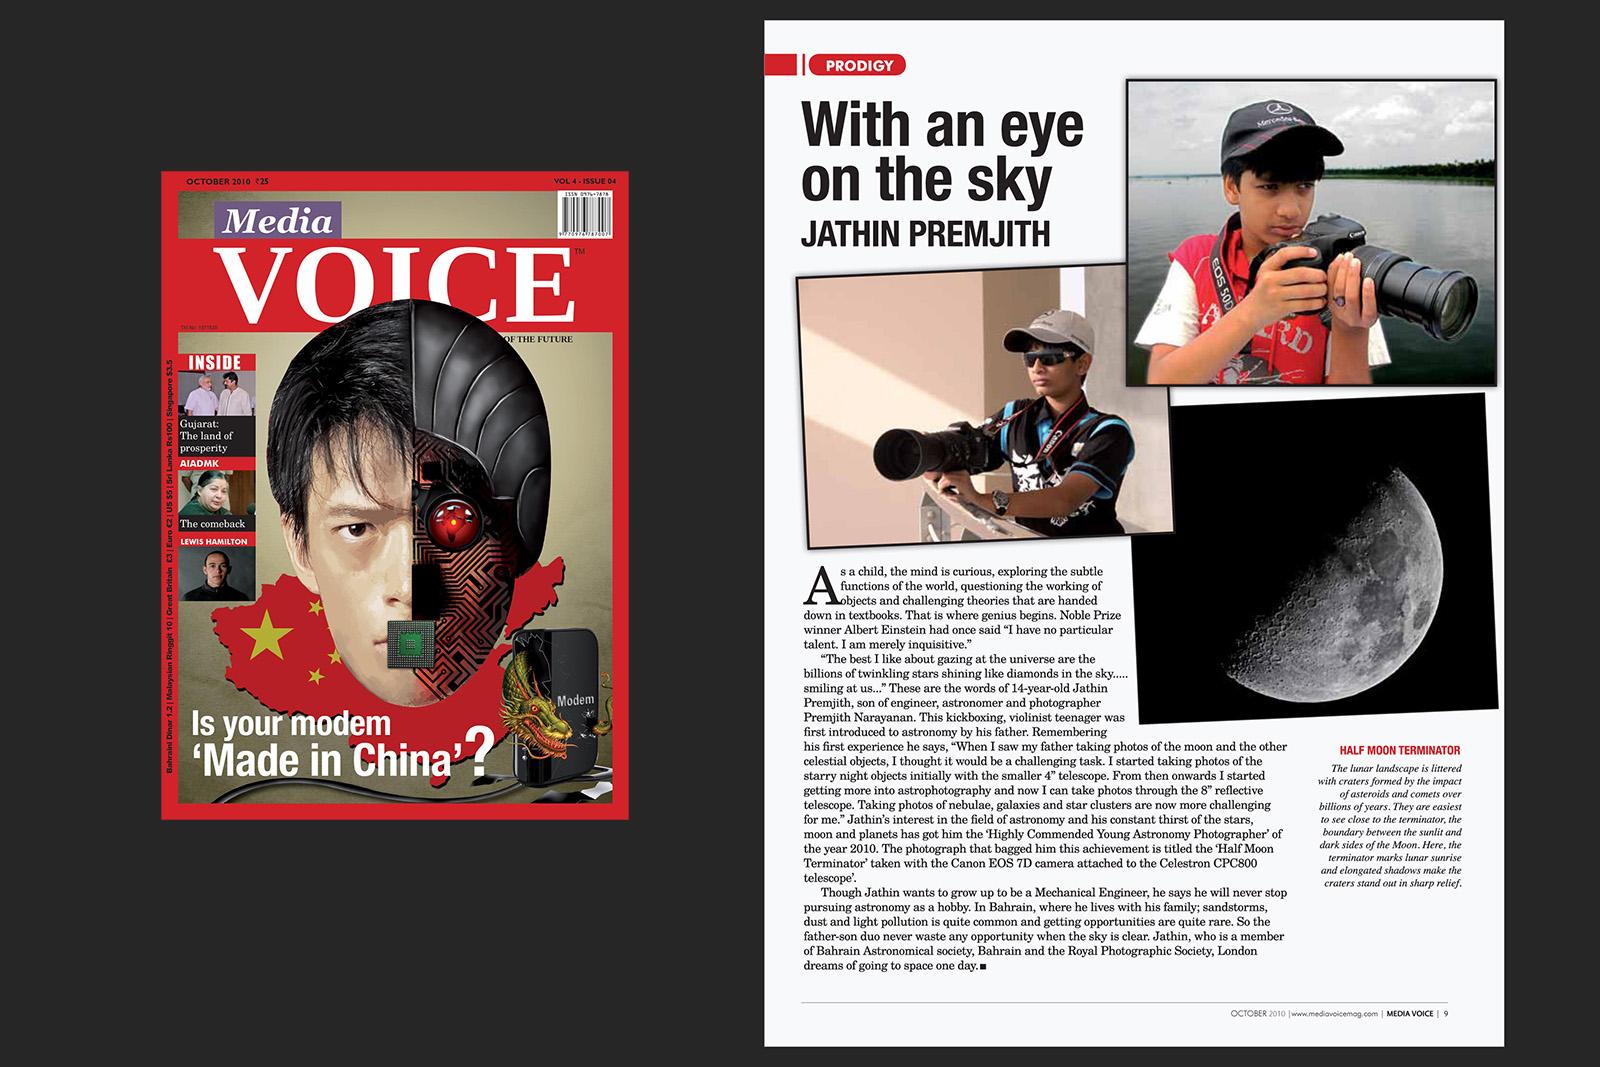 14.Media Voice October Issue_Jathin Premjith copy copy